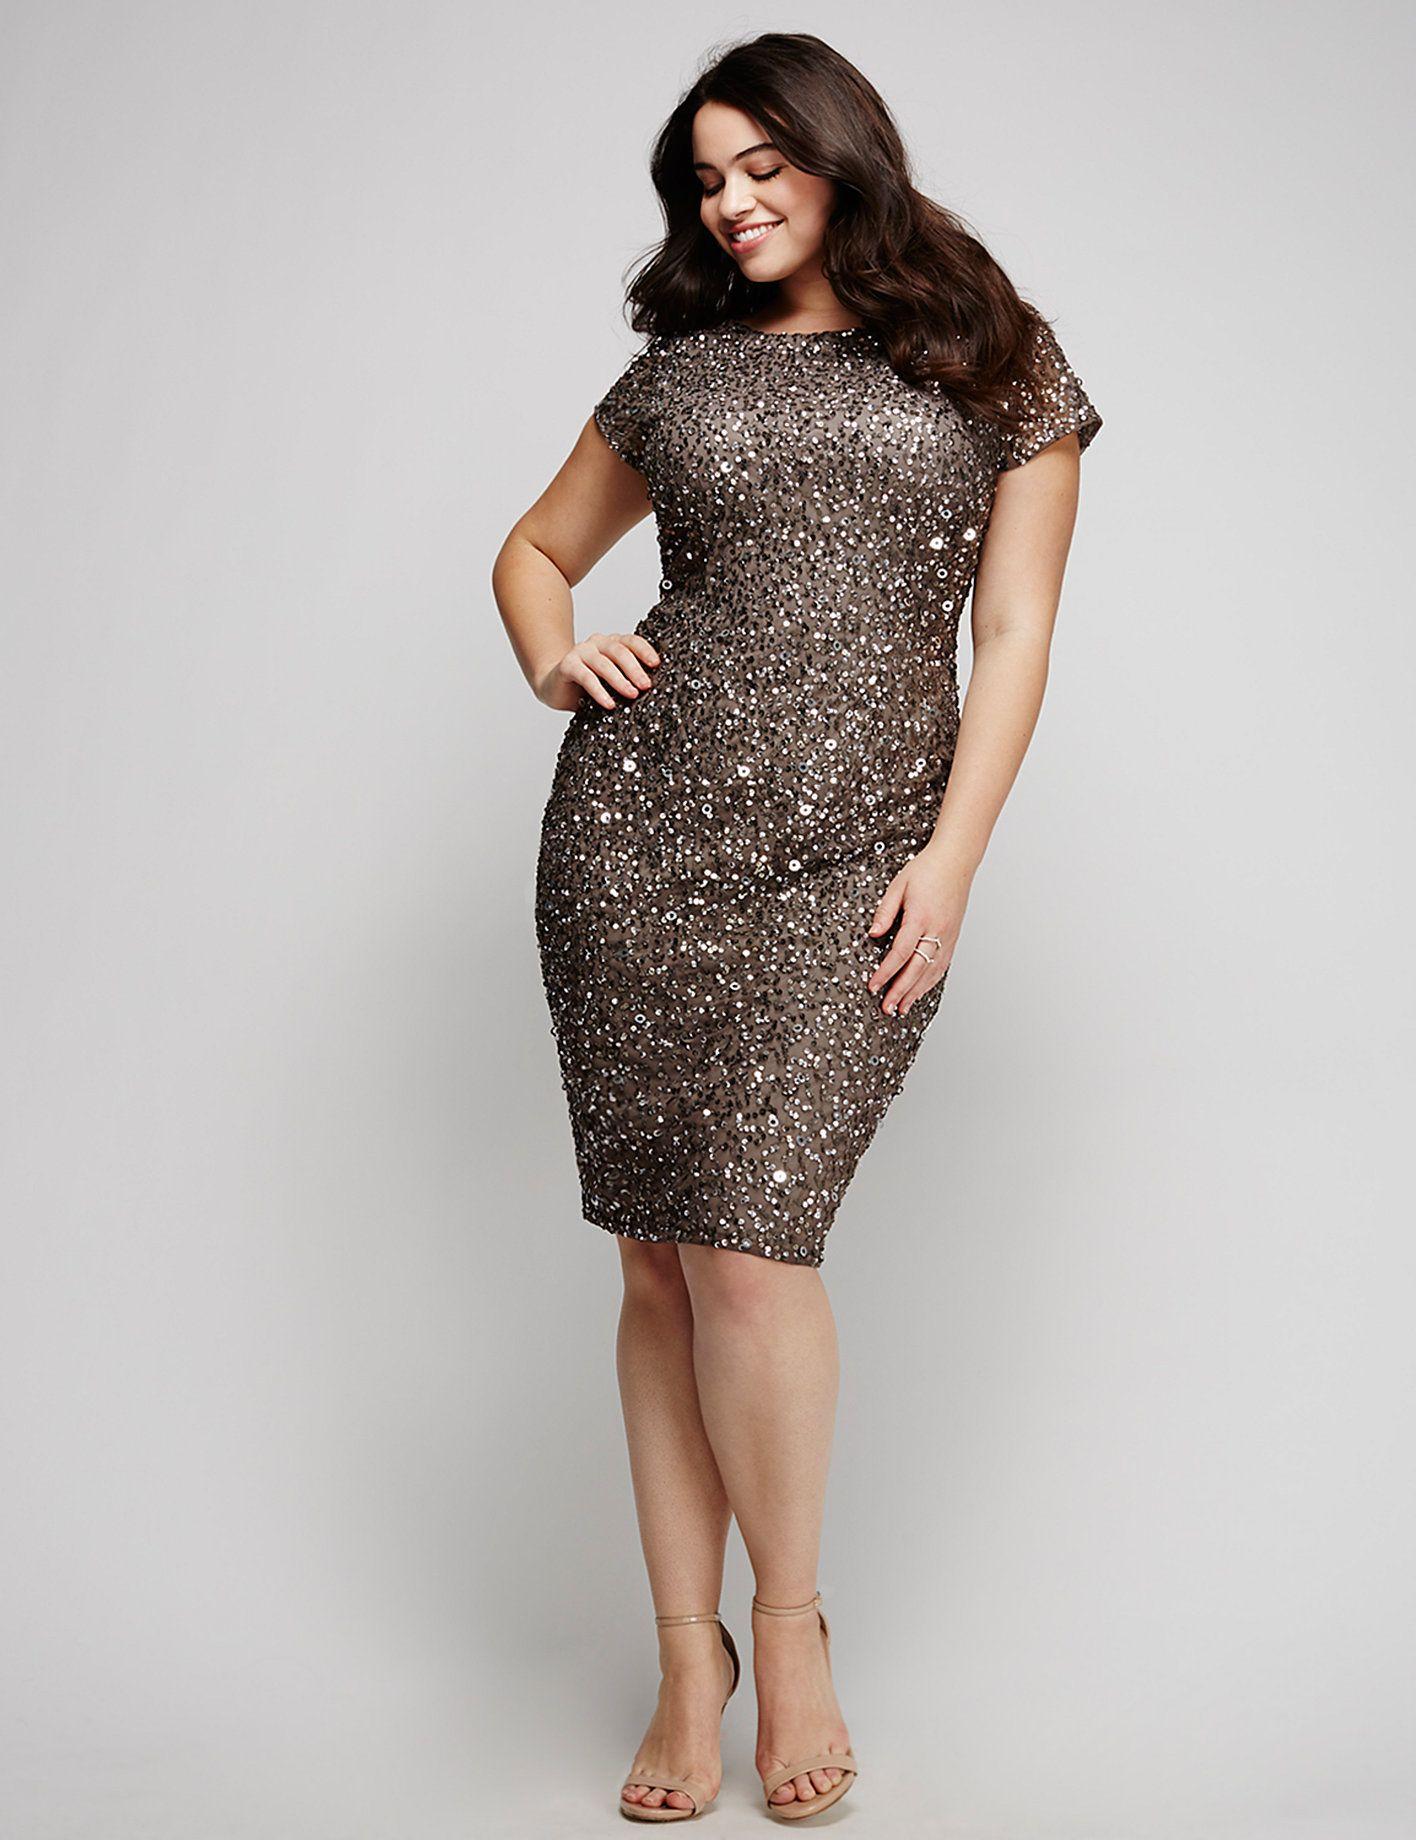 Plus Size Dresses & Skirts for Women Size 14-28 | Lane Bryant ...